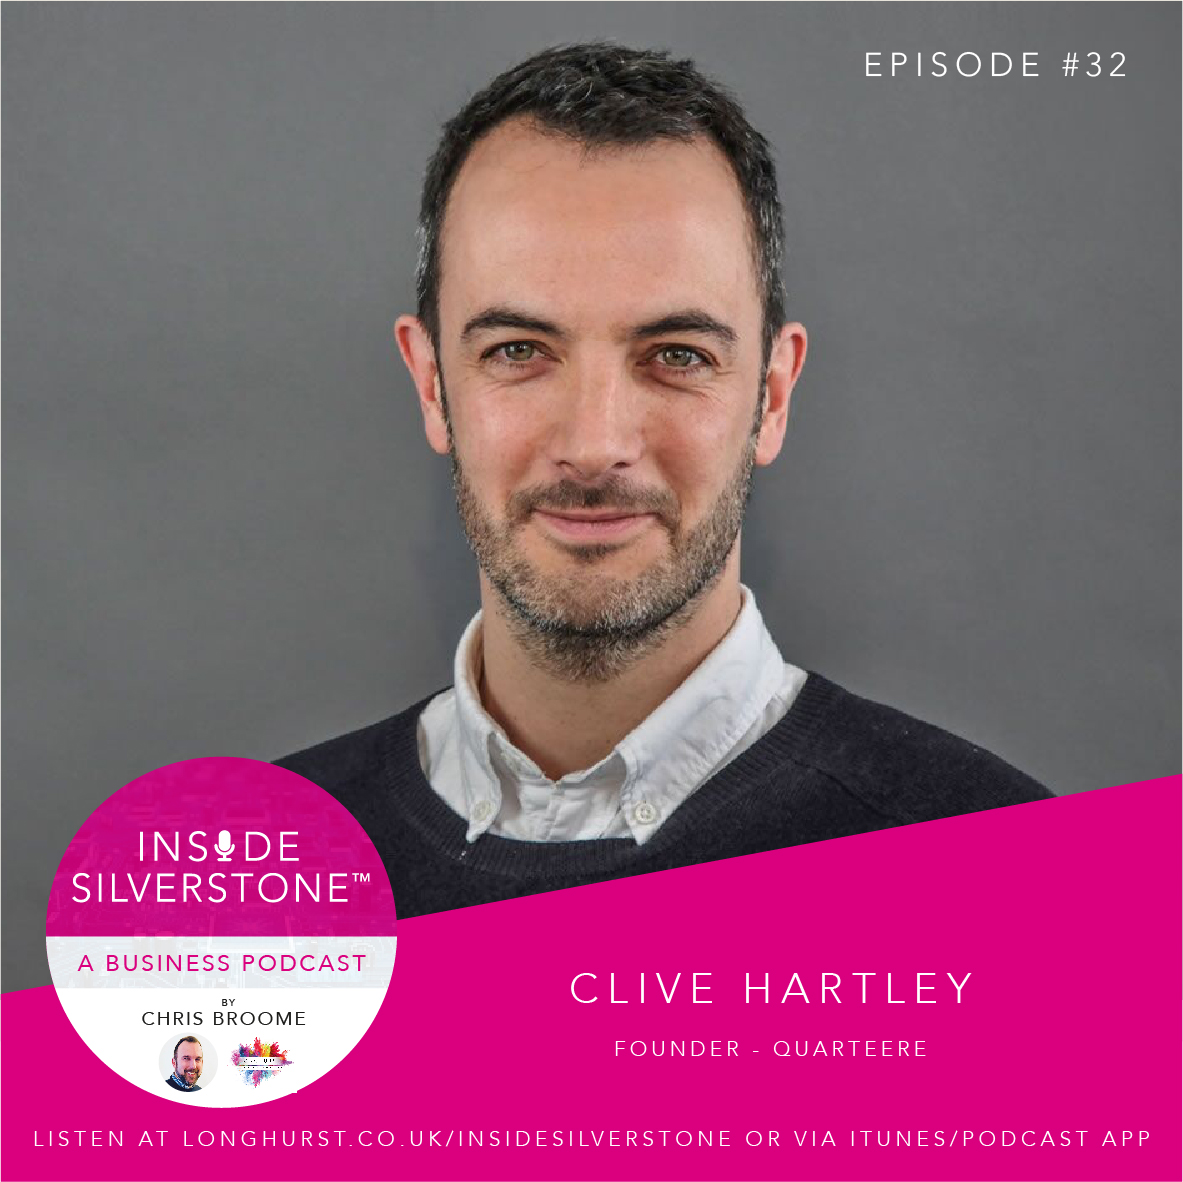 Clive Hartley - Founder of Quarteere